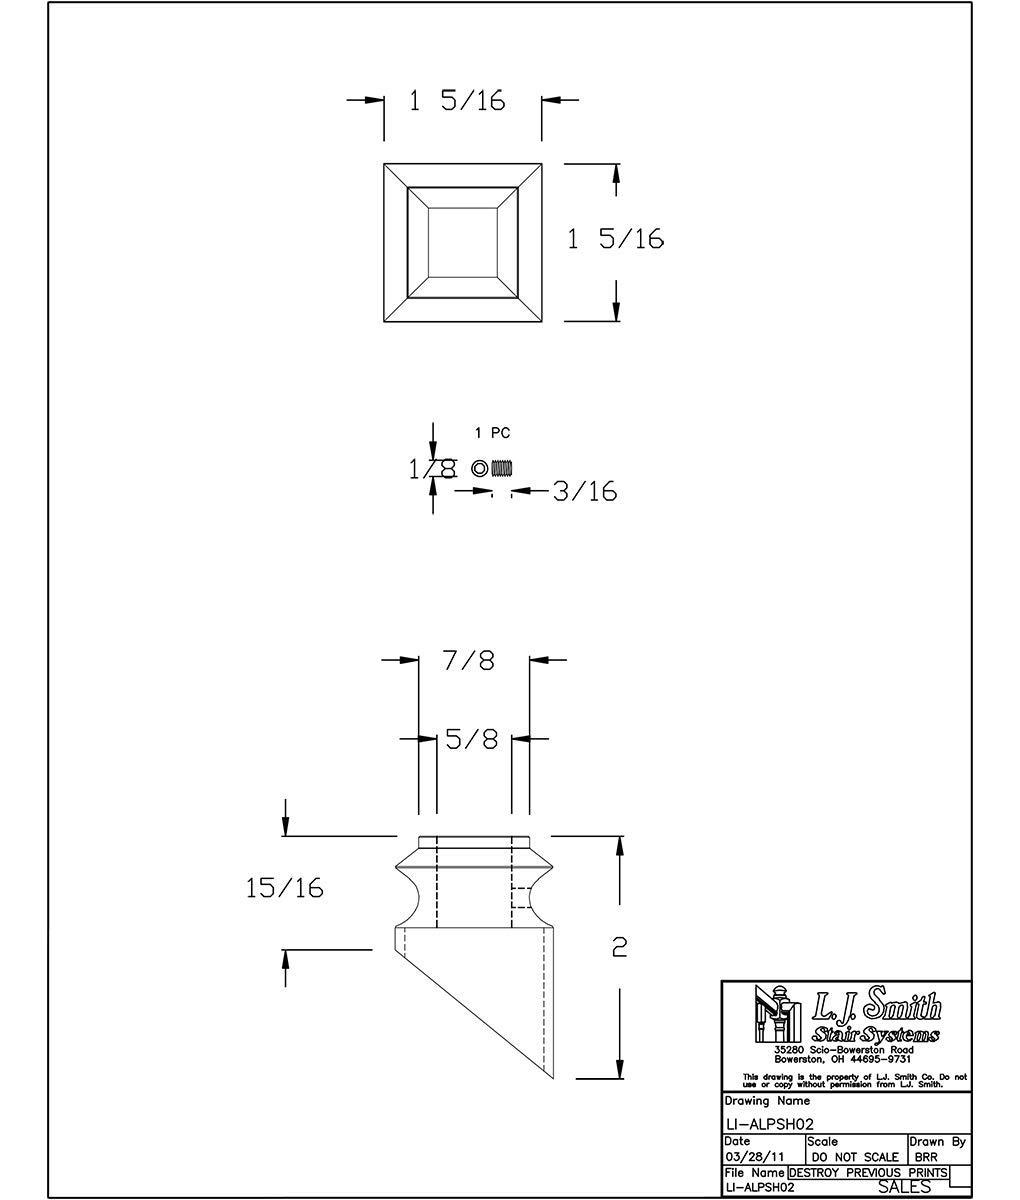 LI-ALPSH02-MB: Aluminum Pitch Shoe for 1/2'' Hollow Square Aluminum Balusters (Matte Black)